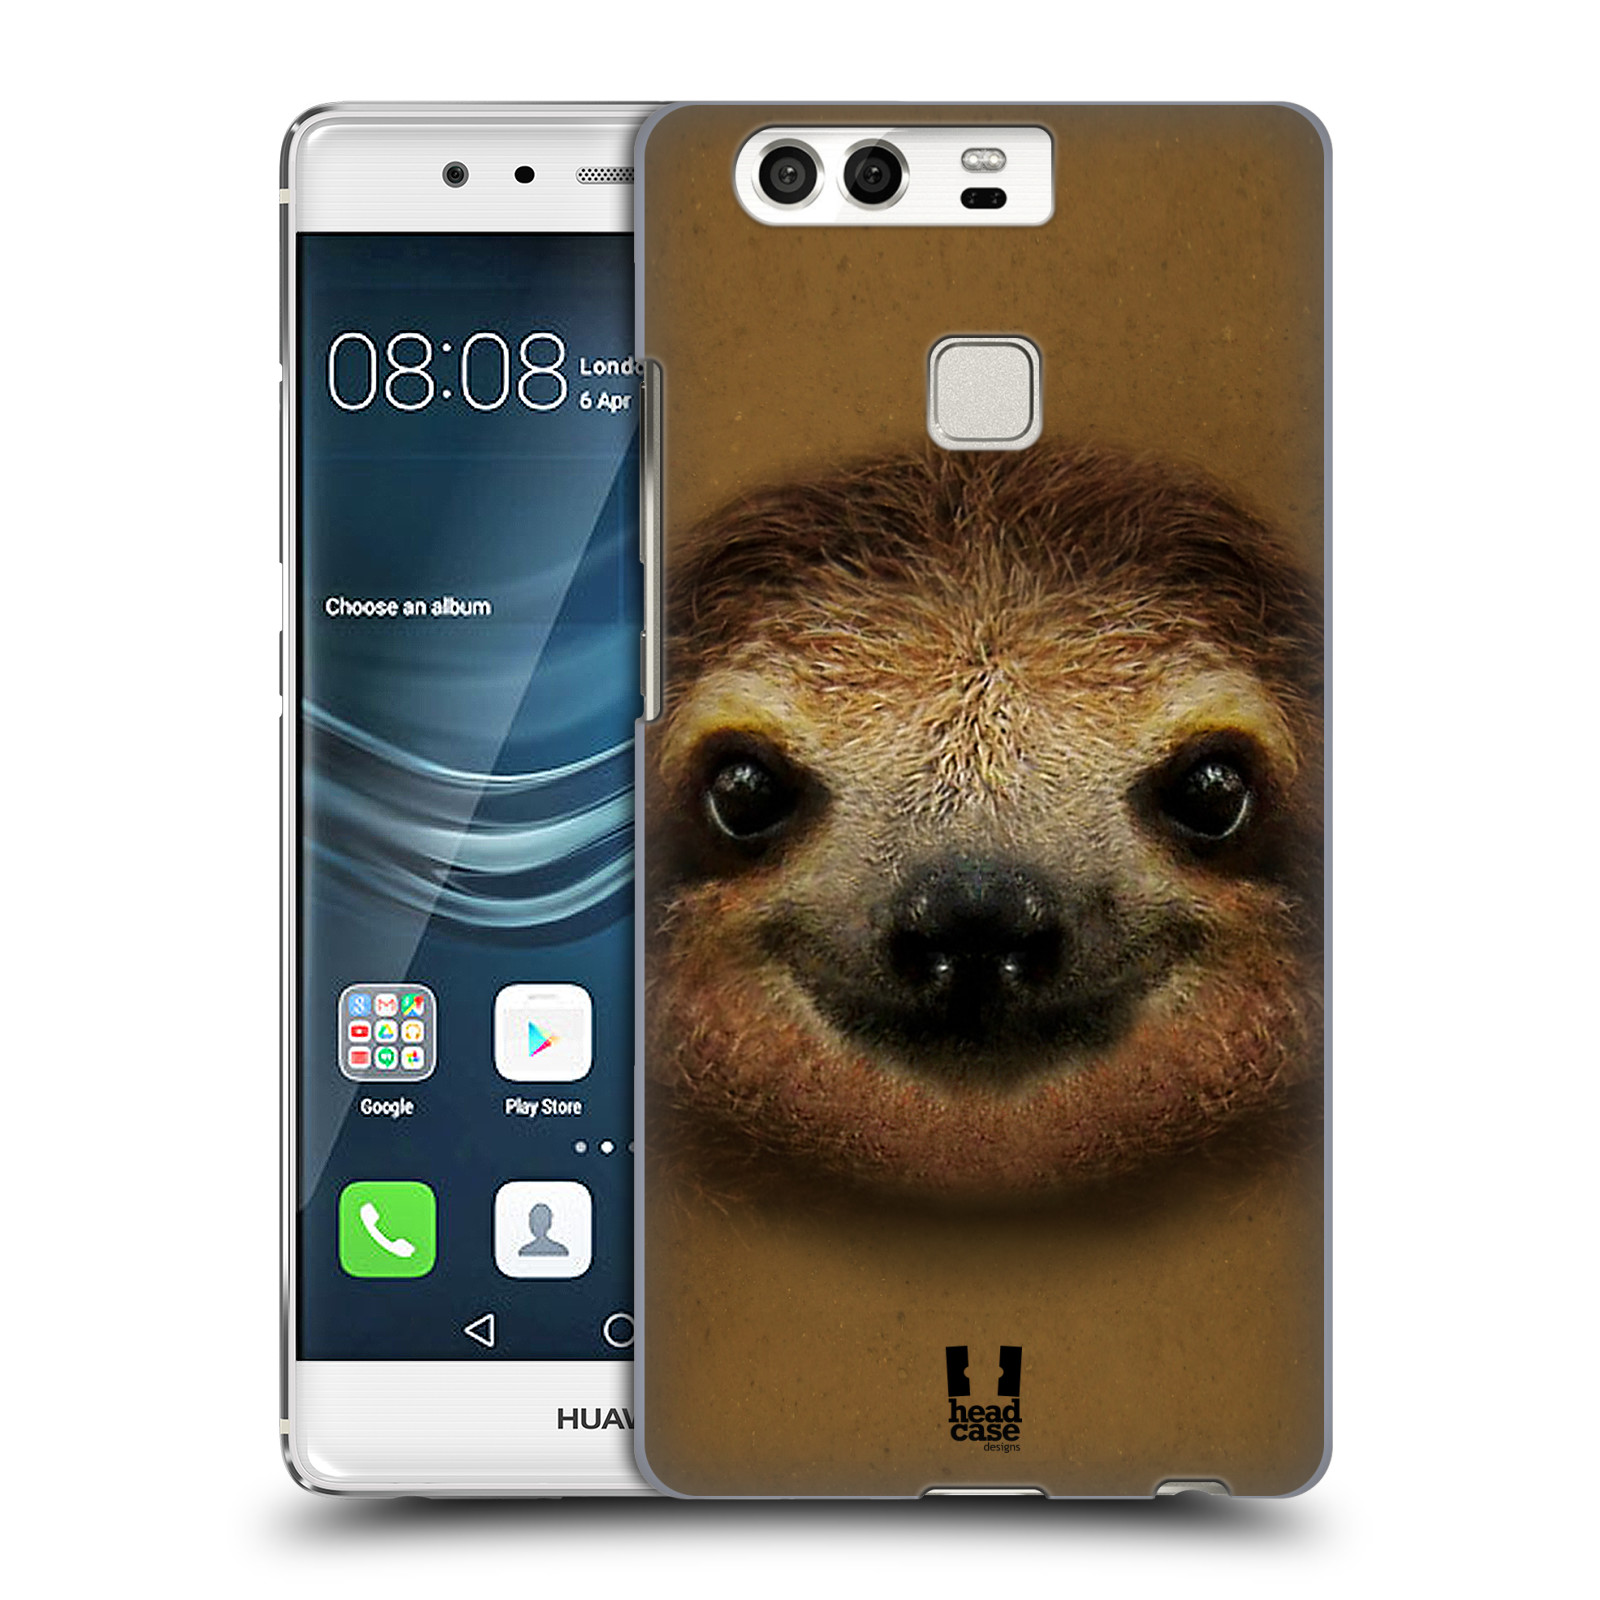 HEAD CASE plastový obal na mobil Huawei P9 / P9 DUAL SIM vzor Zvířecí tváře 2 lenochod